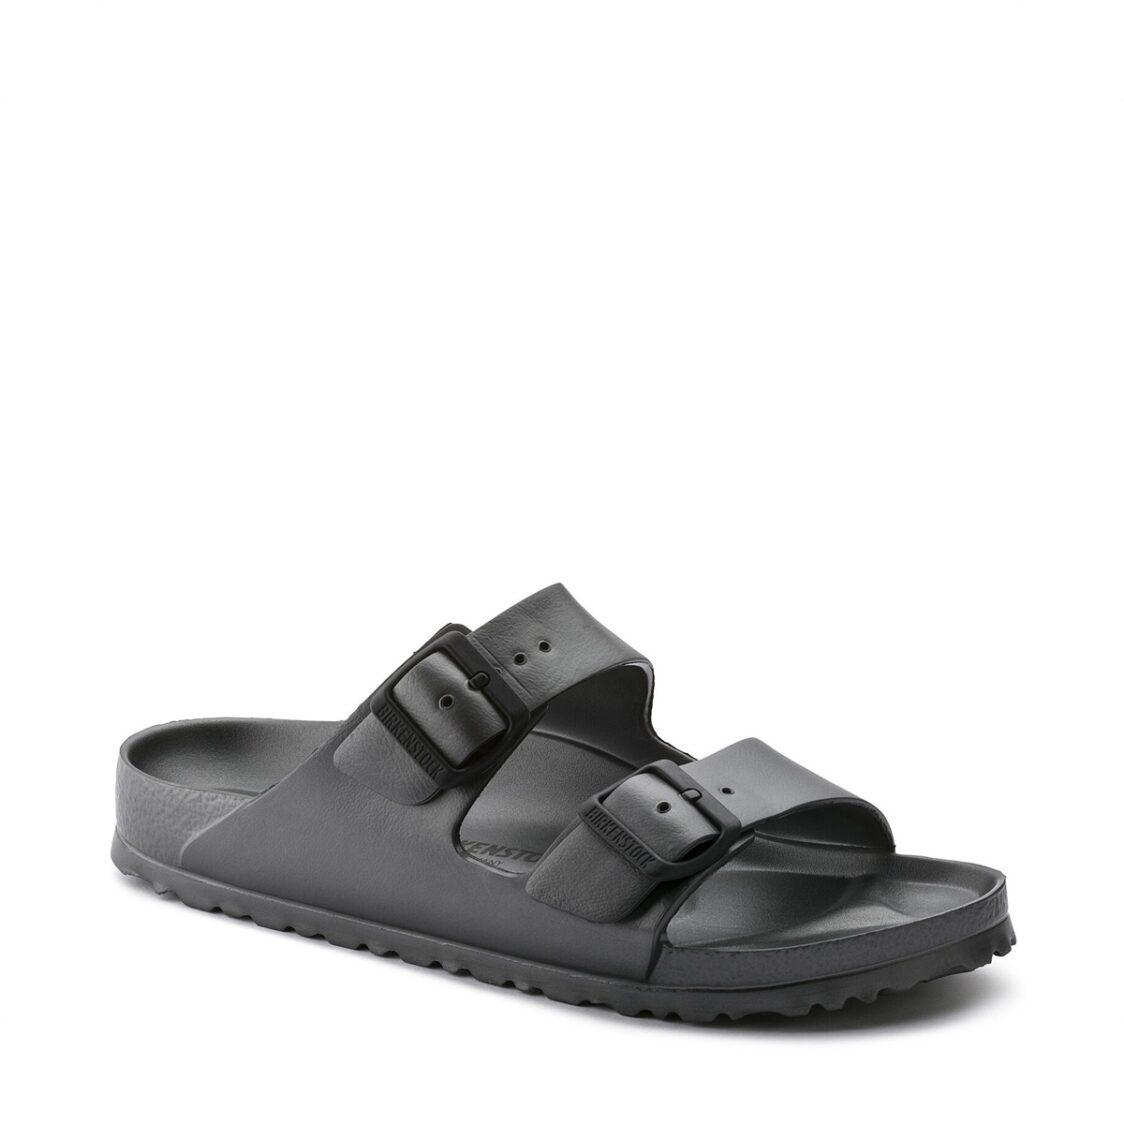 Birkenstock Arizona EVA Womens Narrow Width Sandals Anthracite